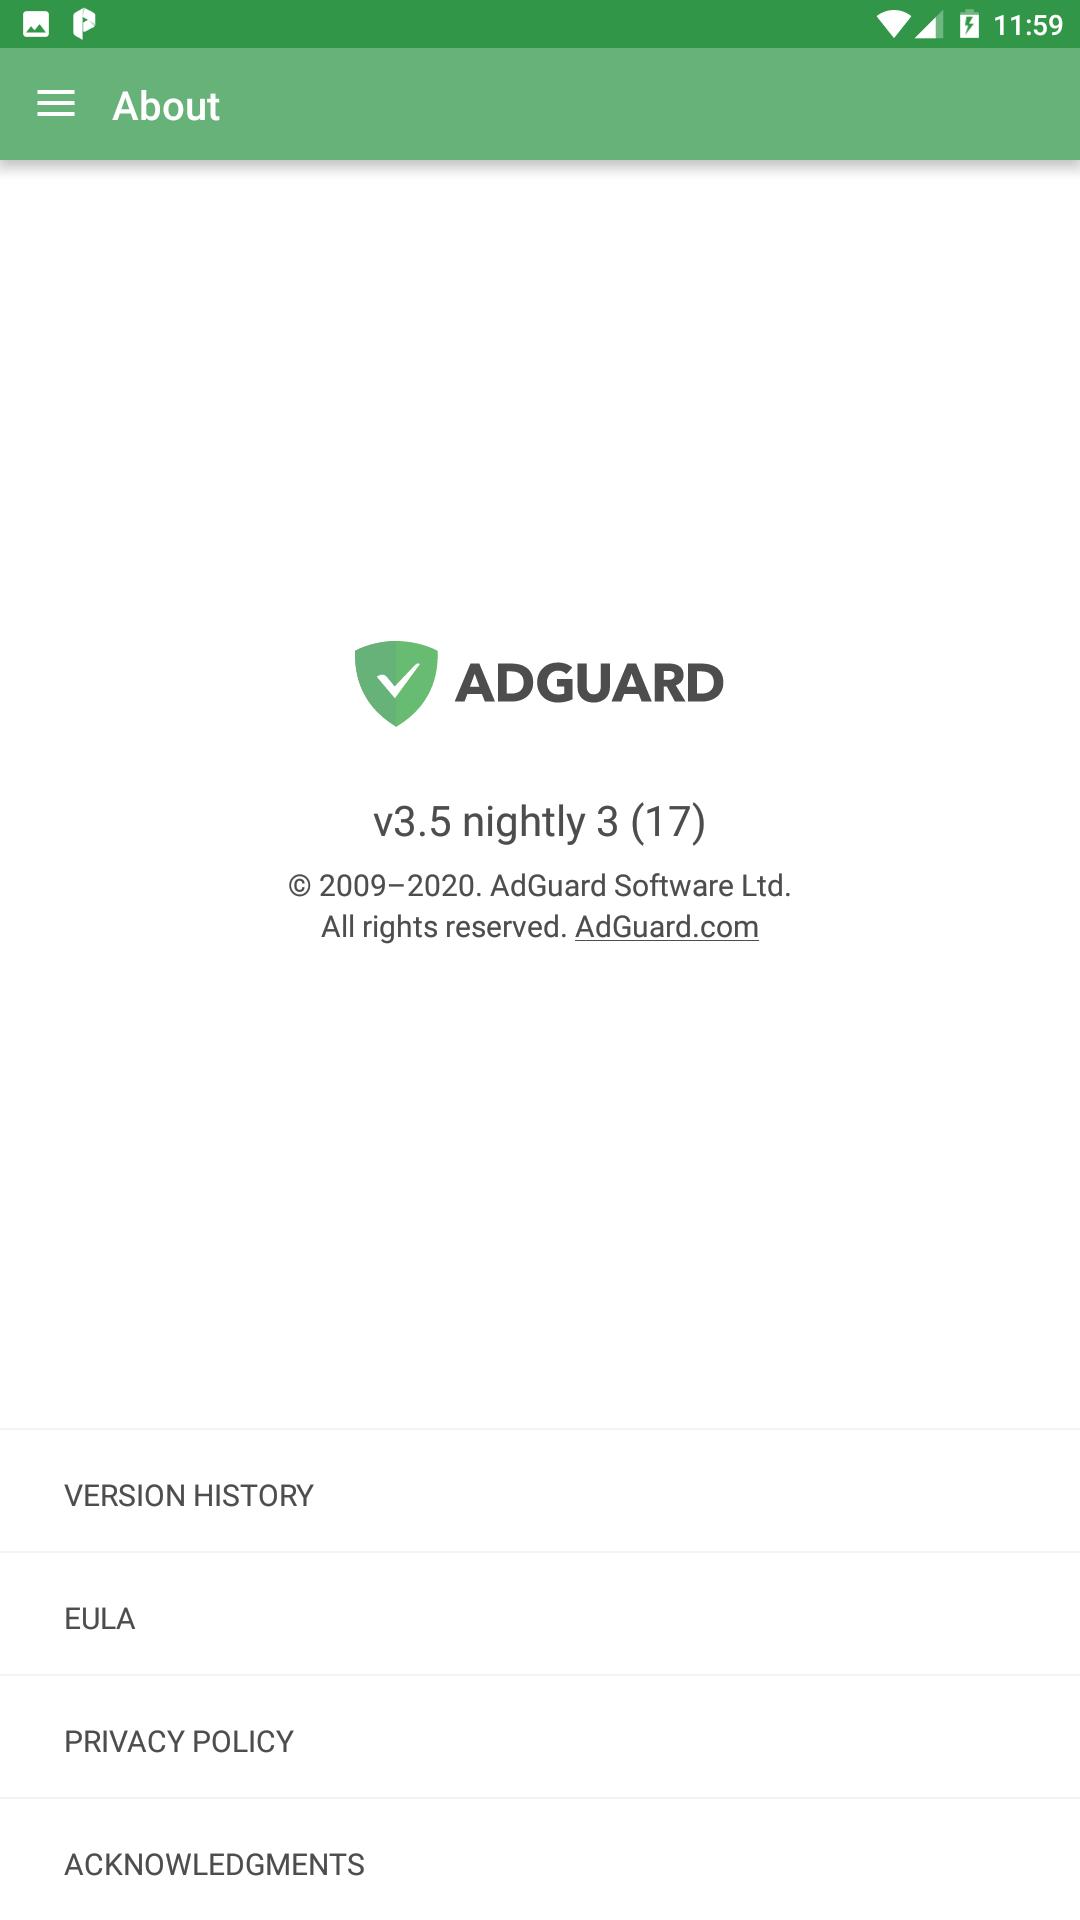 Adguard3.5n3